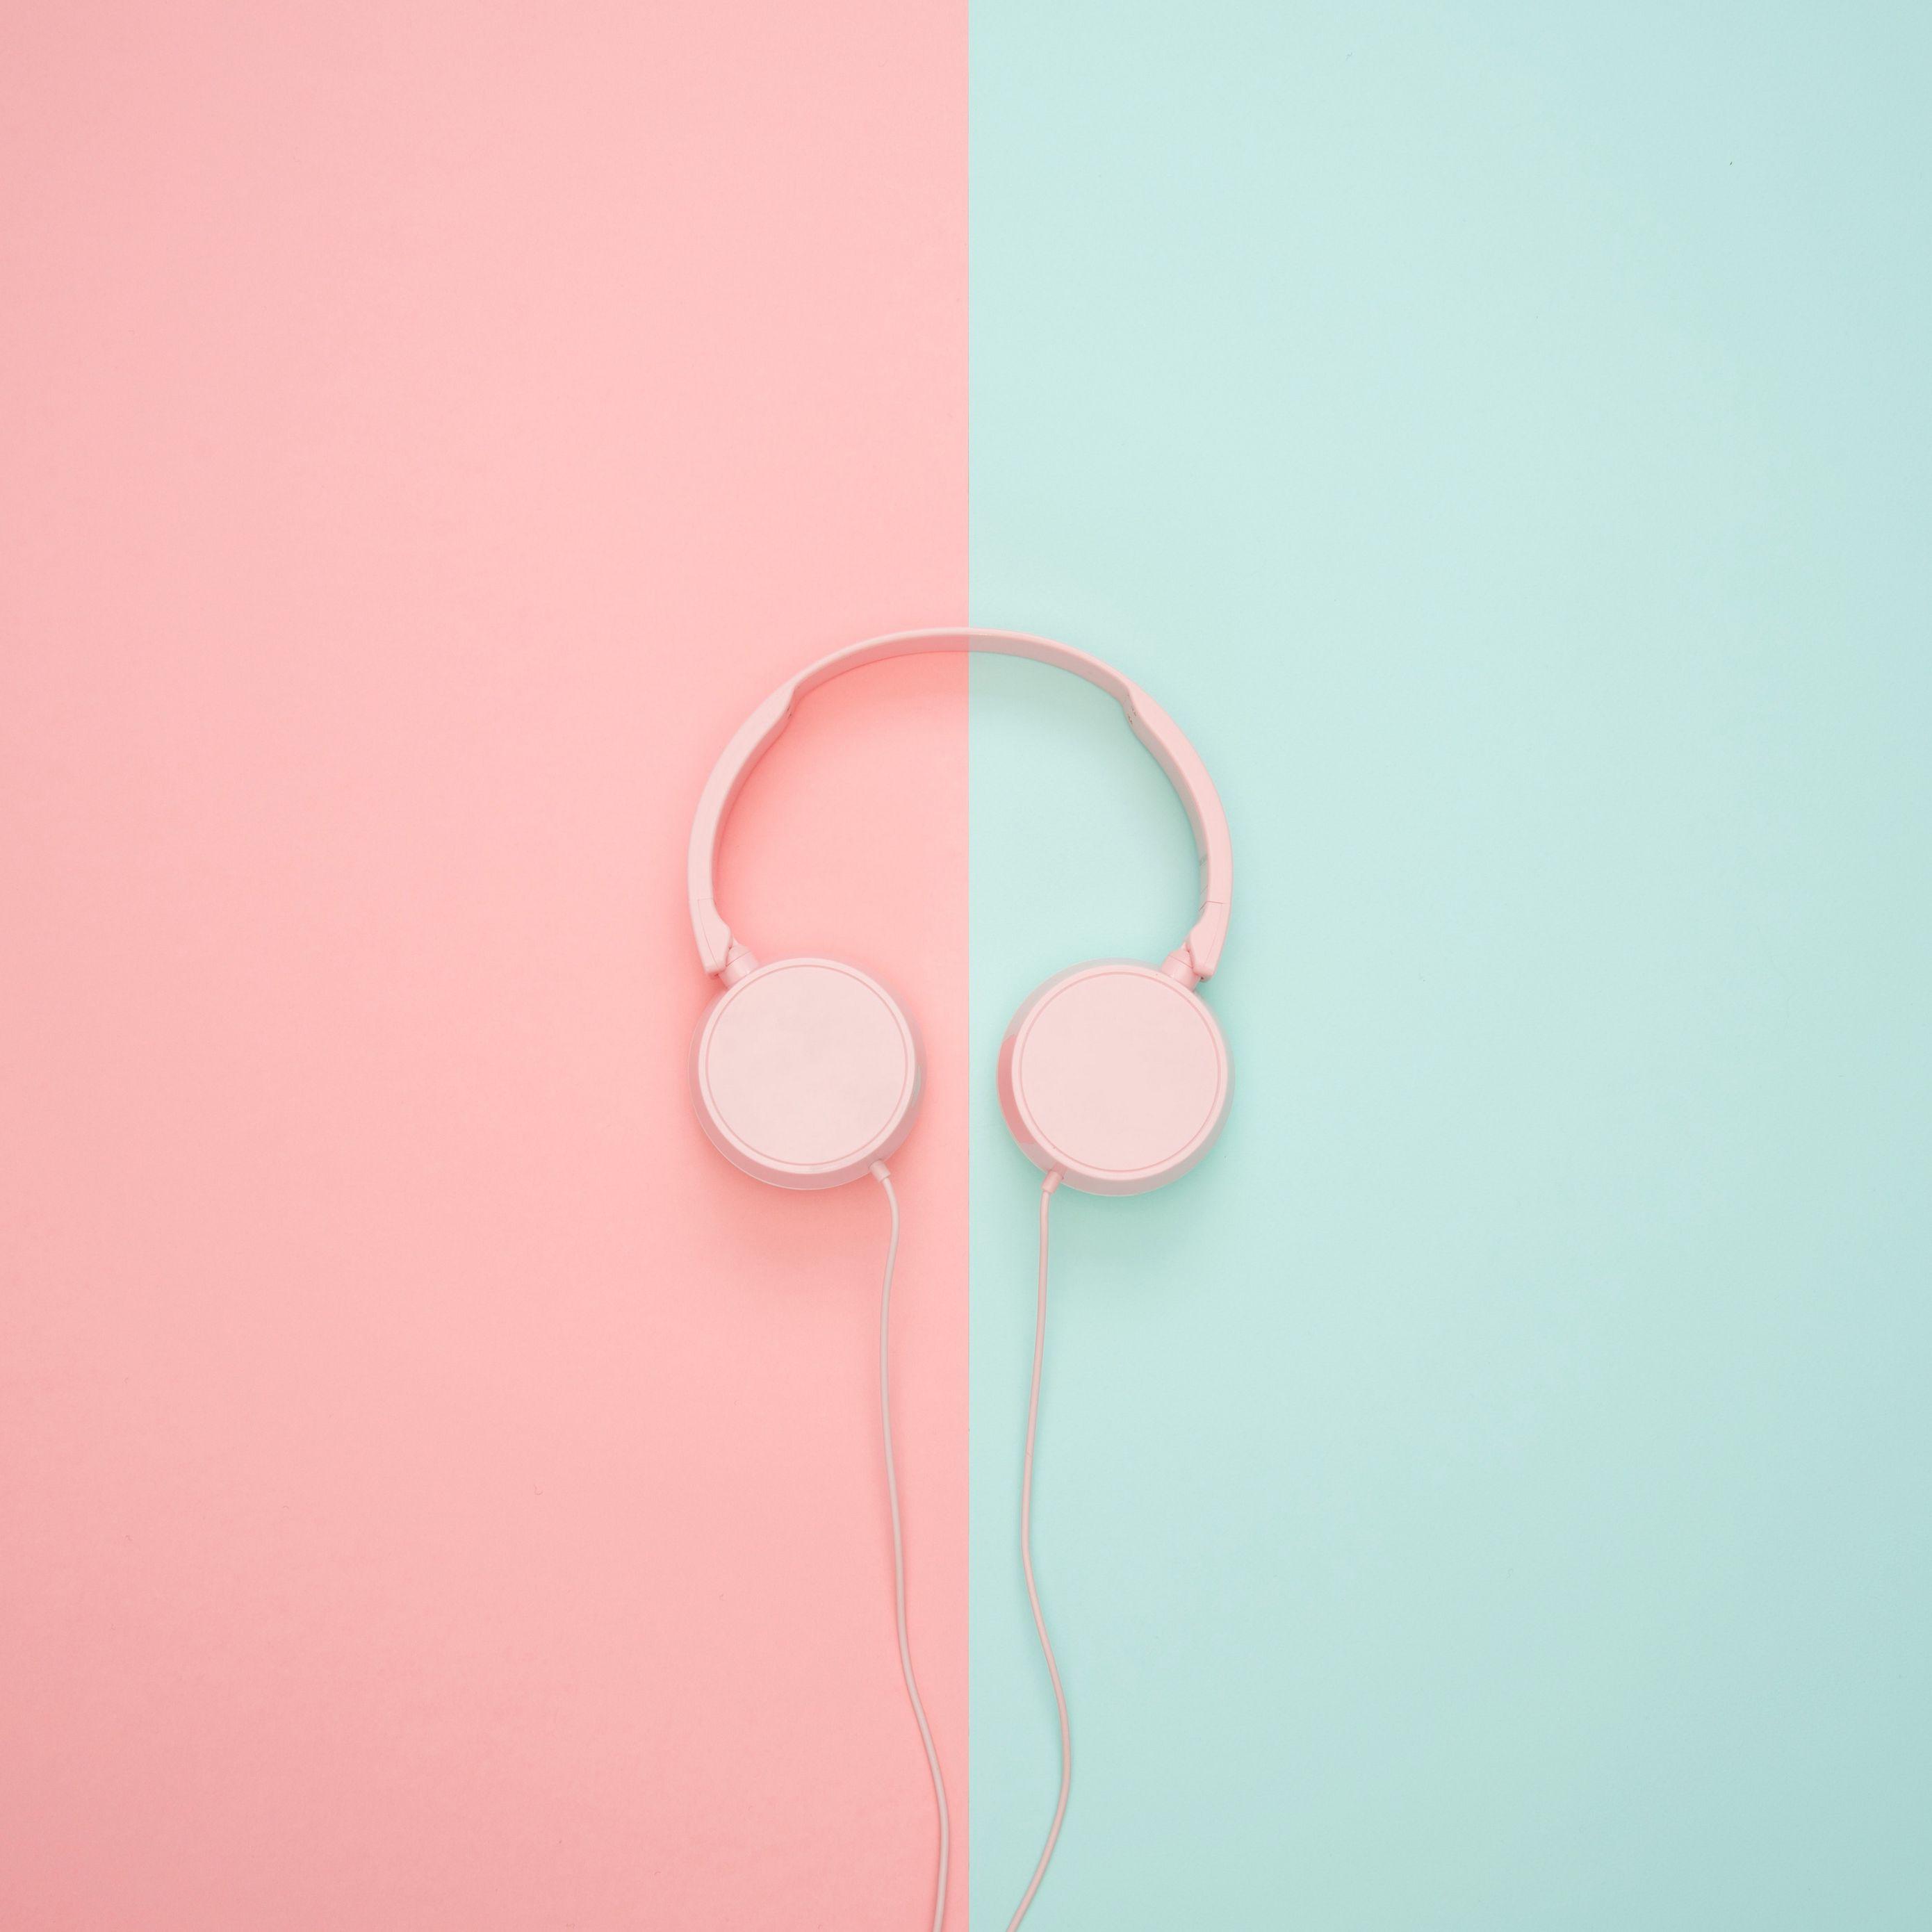 2780x2780 Wallpaper headphones, minimalism, pink, pastel